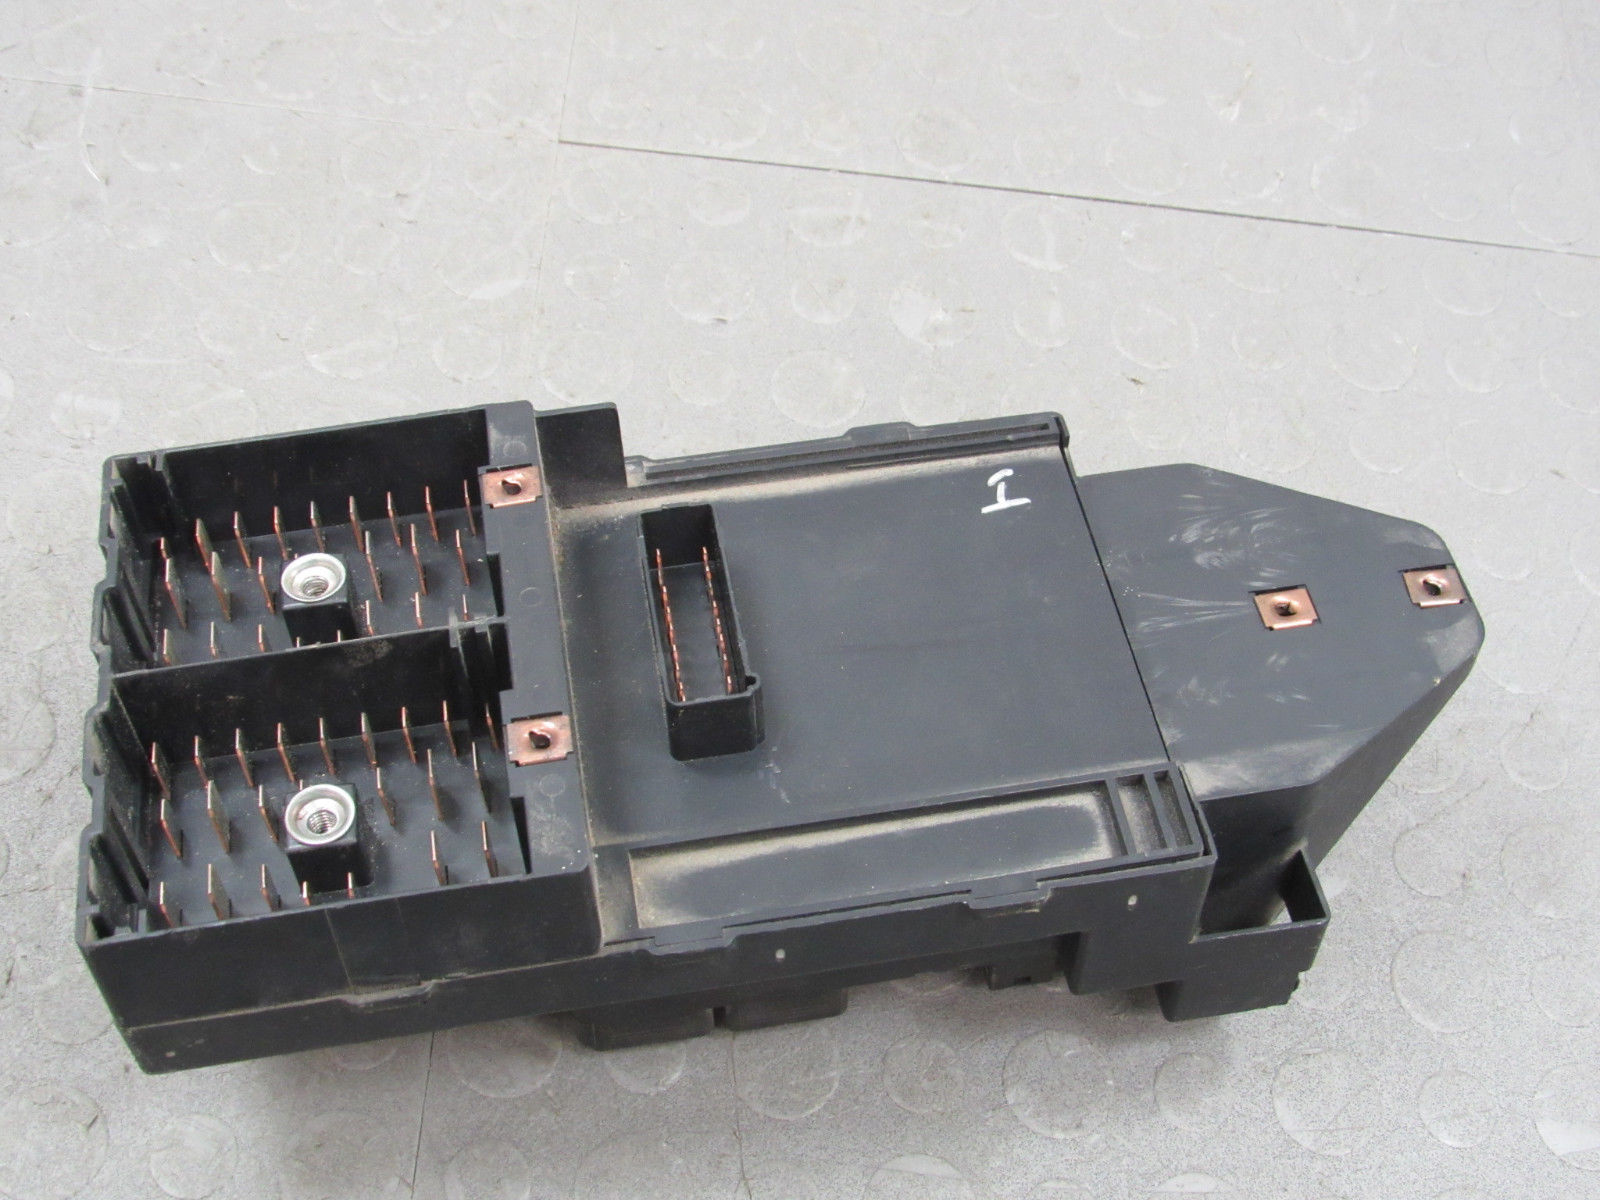 98 Ford F 150 250 44 Bcm Gem Multifunction Fuse Relay Box F85b For Sale 14b205 Na Bh